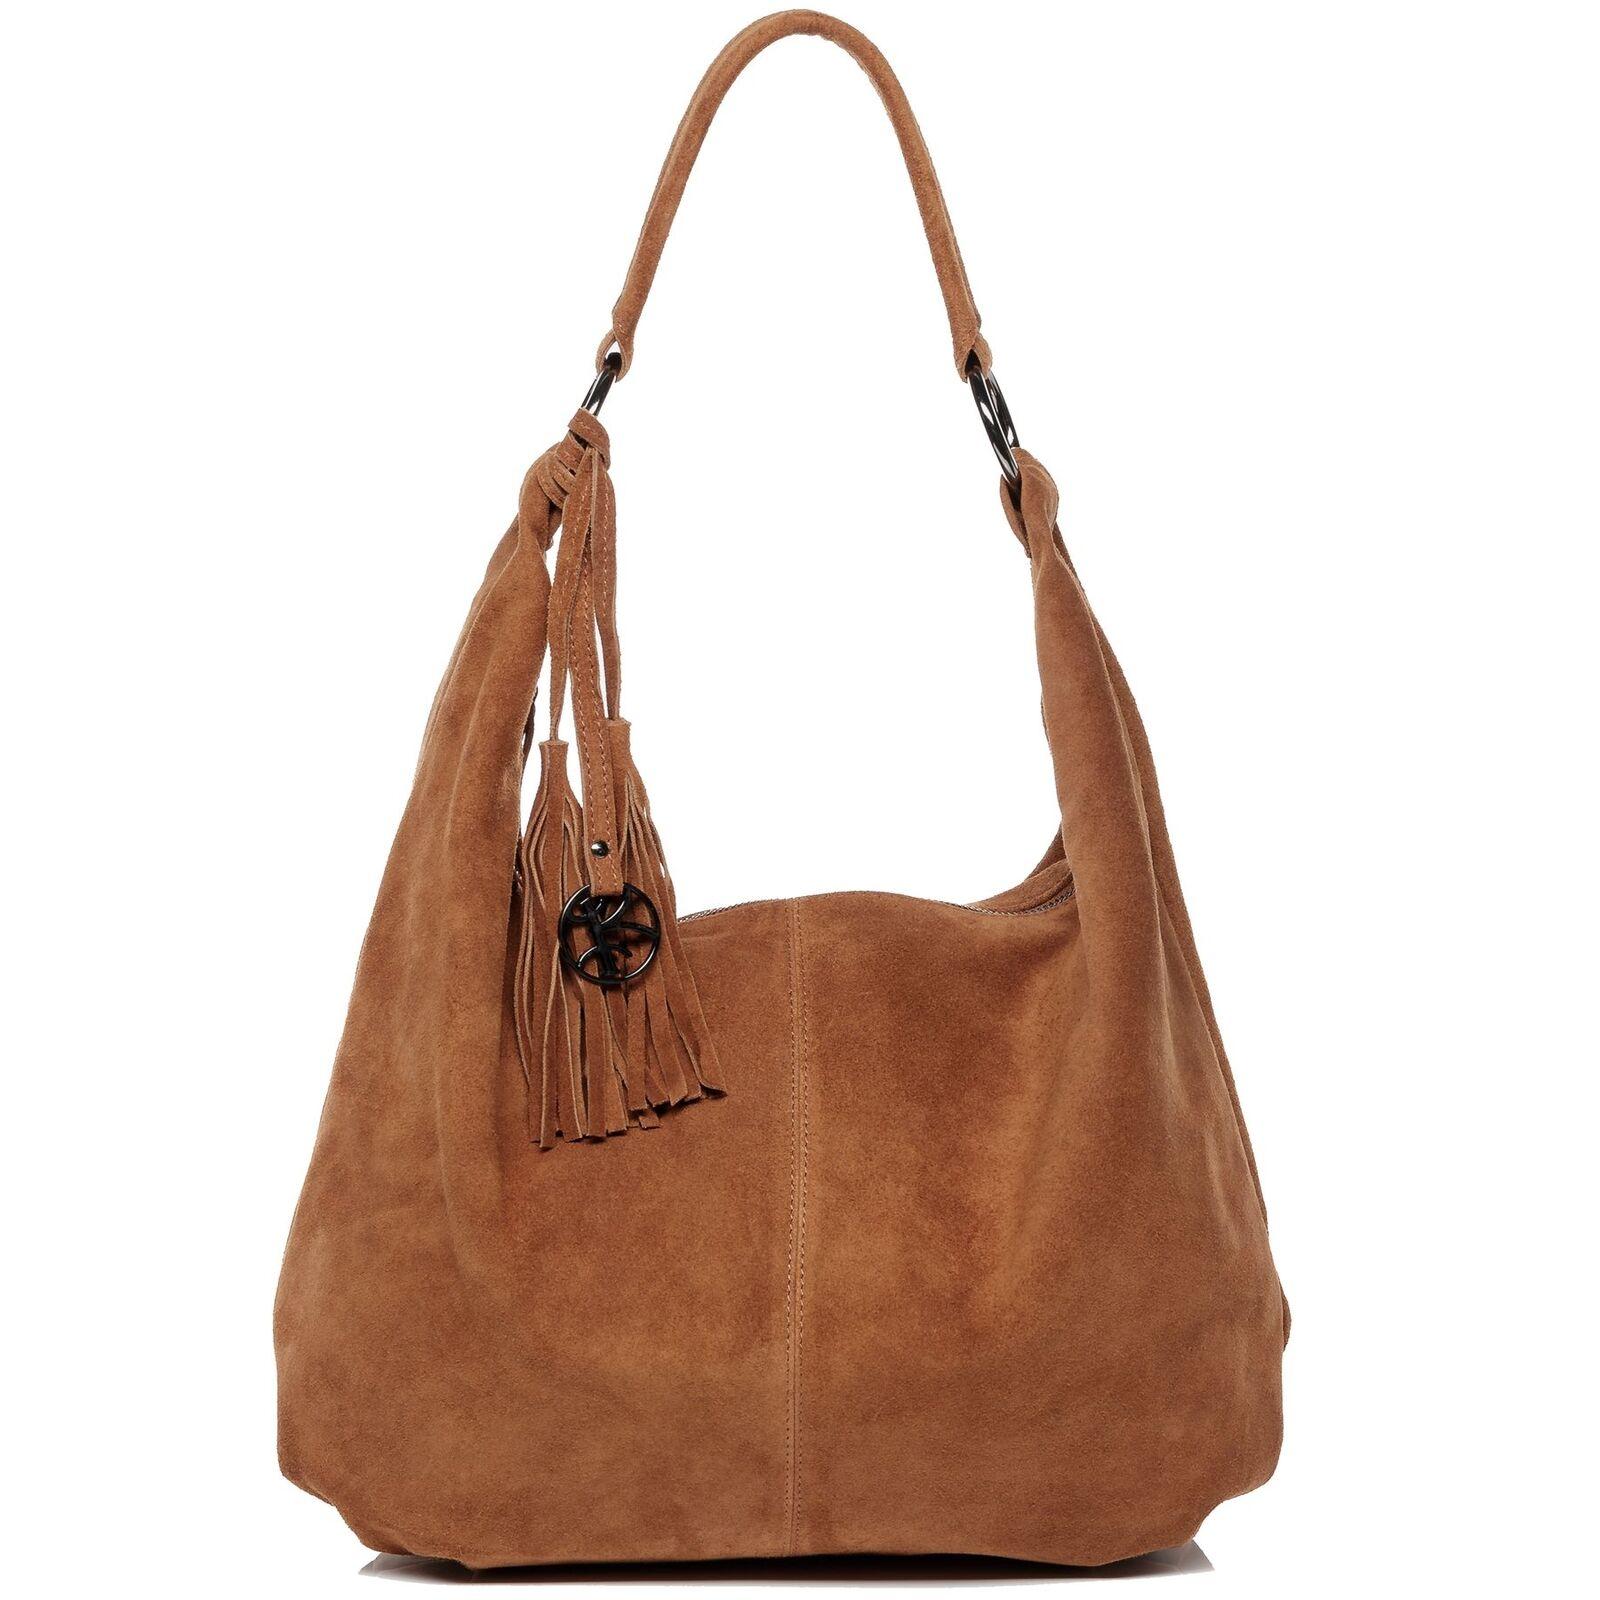 BACCINI Beuteltasche Handtasche Hobo Bag Damen Tasche Schultertasche Wildleder